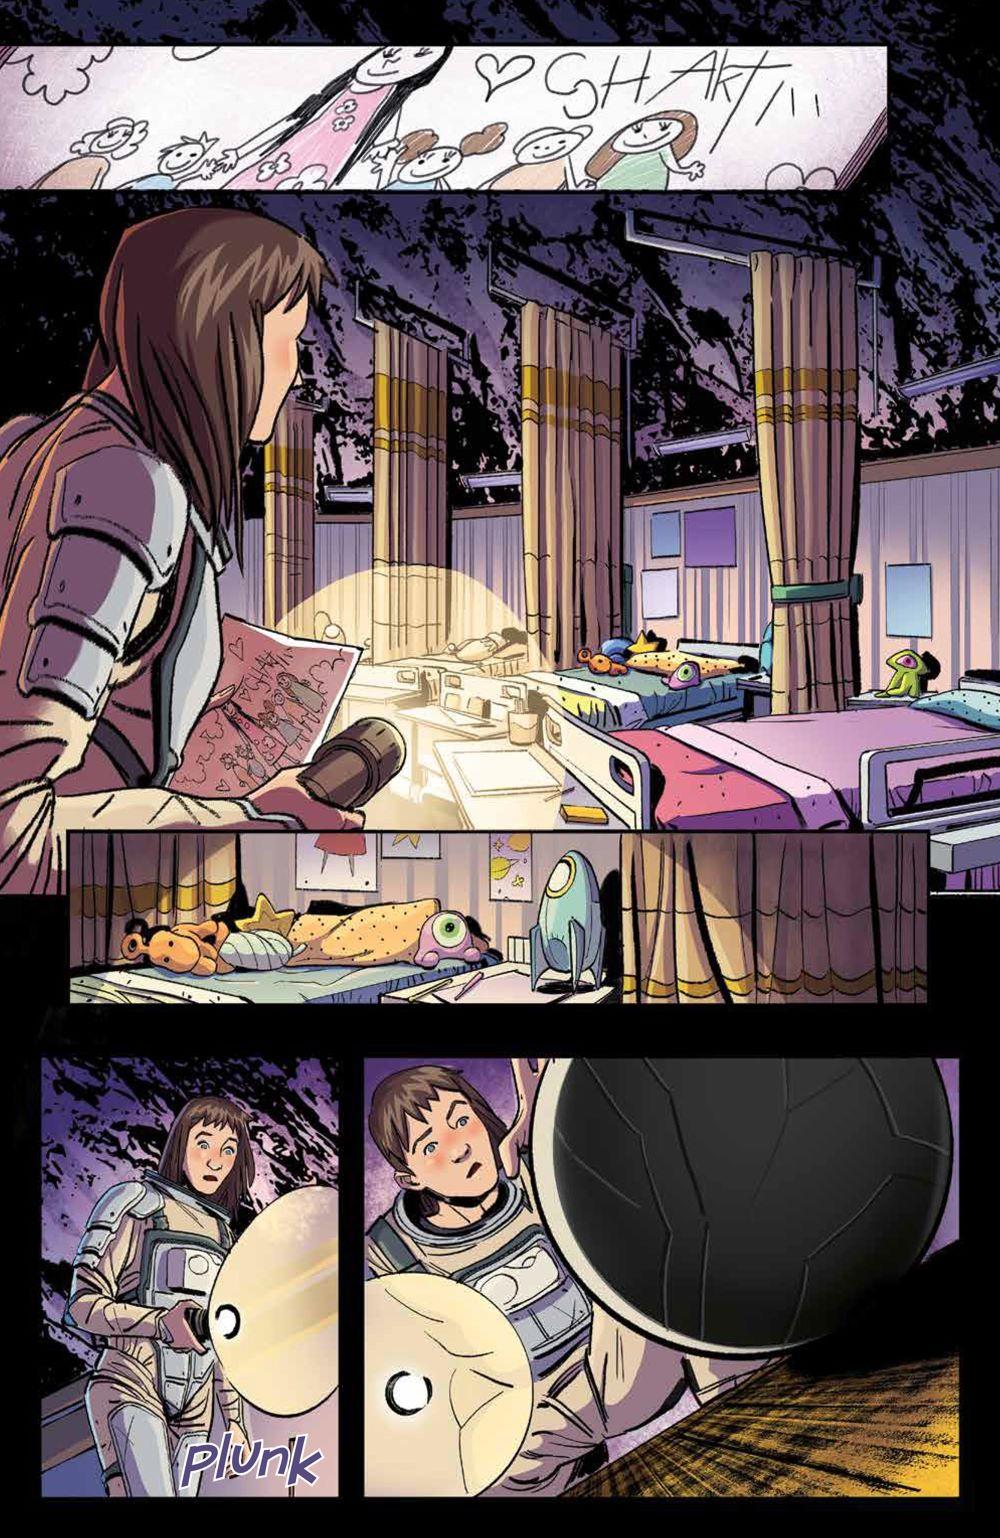 Firefly_BrandNewVerse_005_PRESS_5 ComicList Previews: FIREFLY BRAND NEW 'VERSE #5 (OF 6)